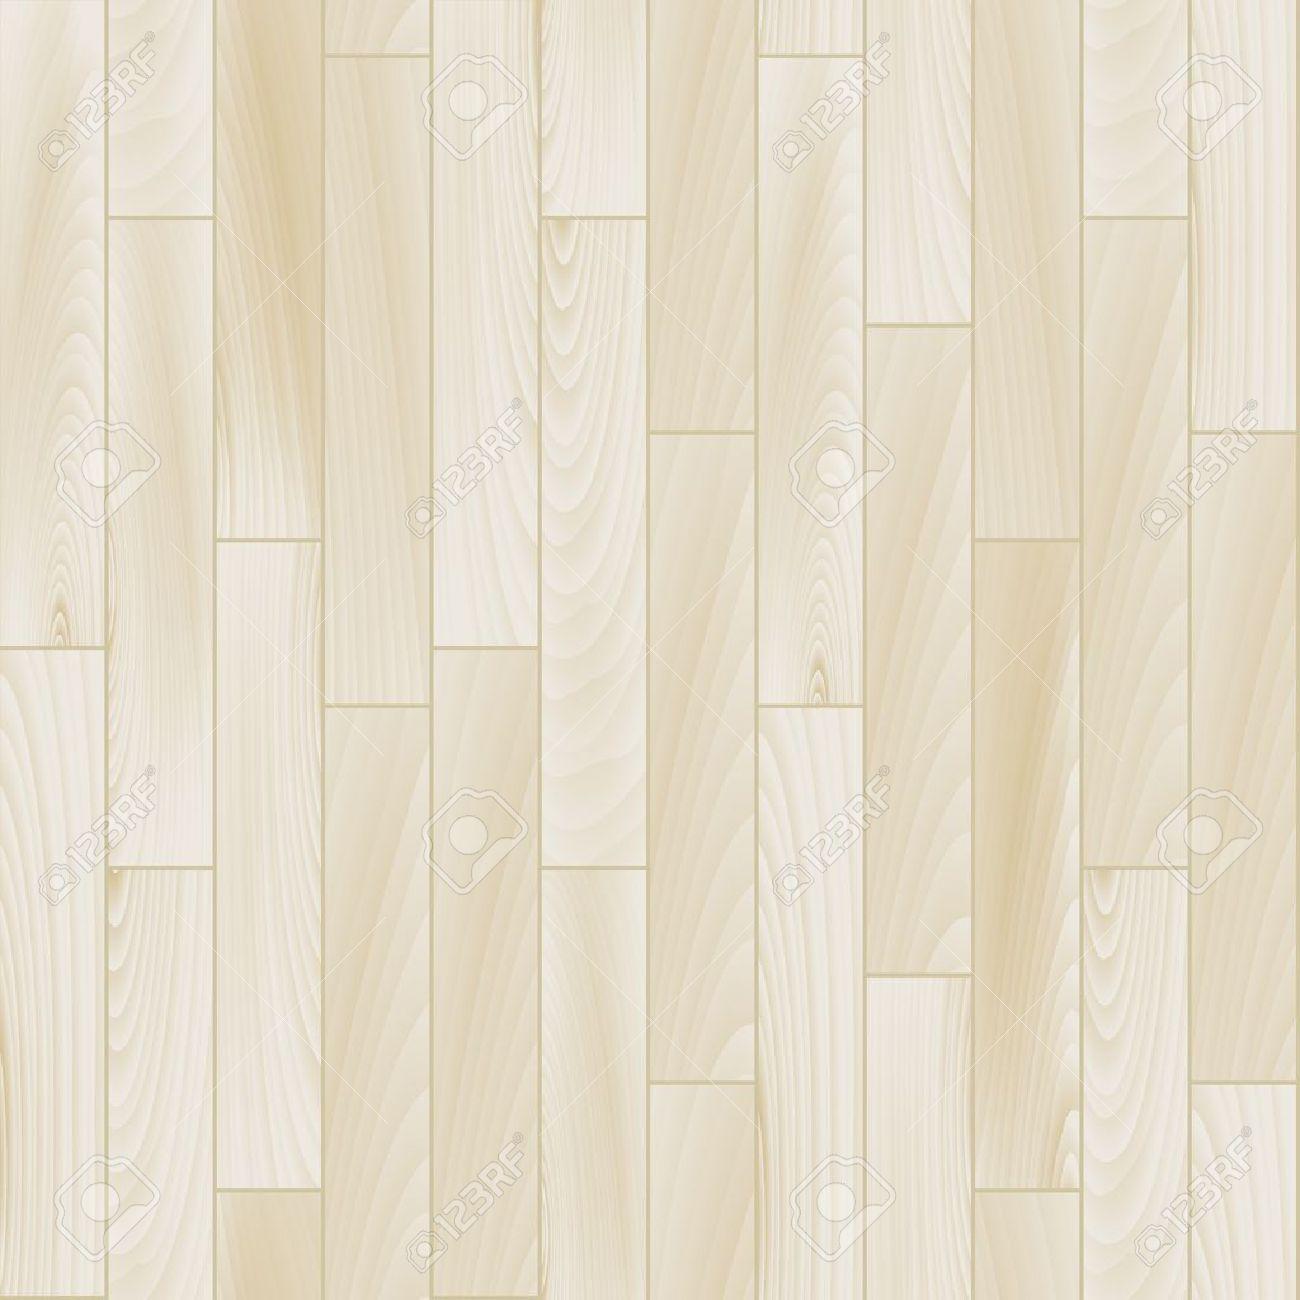 seamless light wood floor.  Light Hardwood Floor Texture S